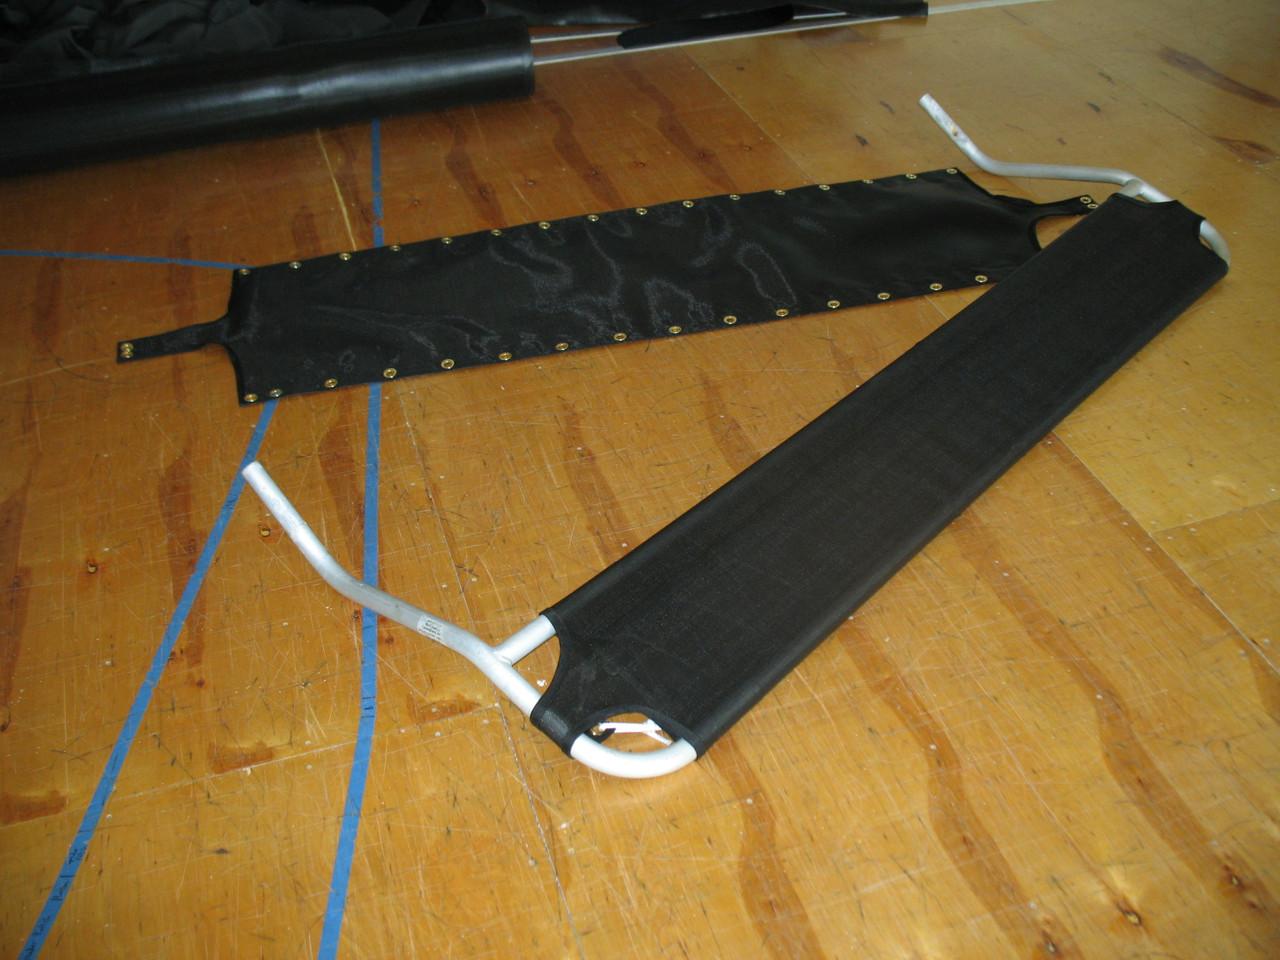 Black basket weave 8oz Polypropylene mesh has unmatched resistance to the elements.